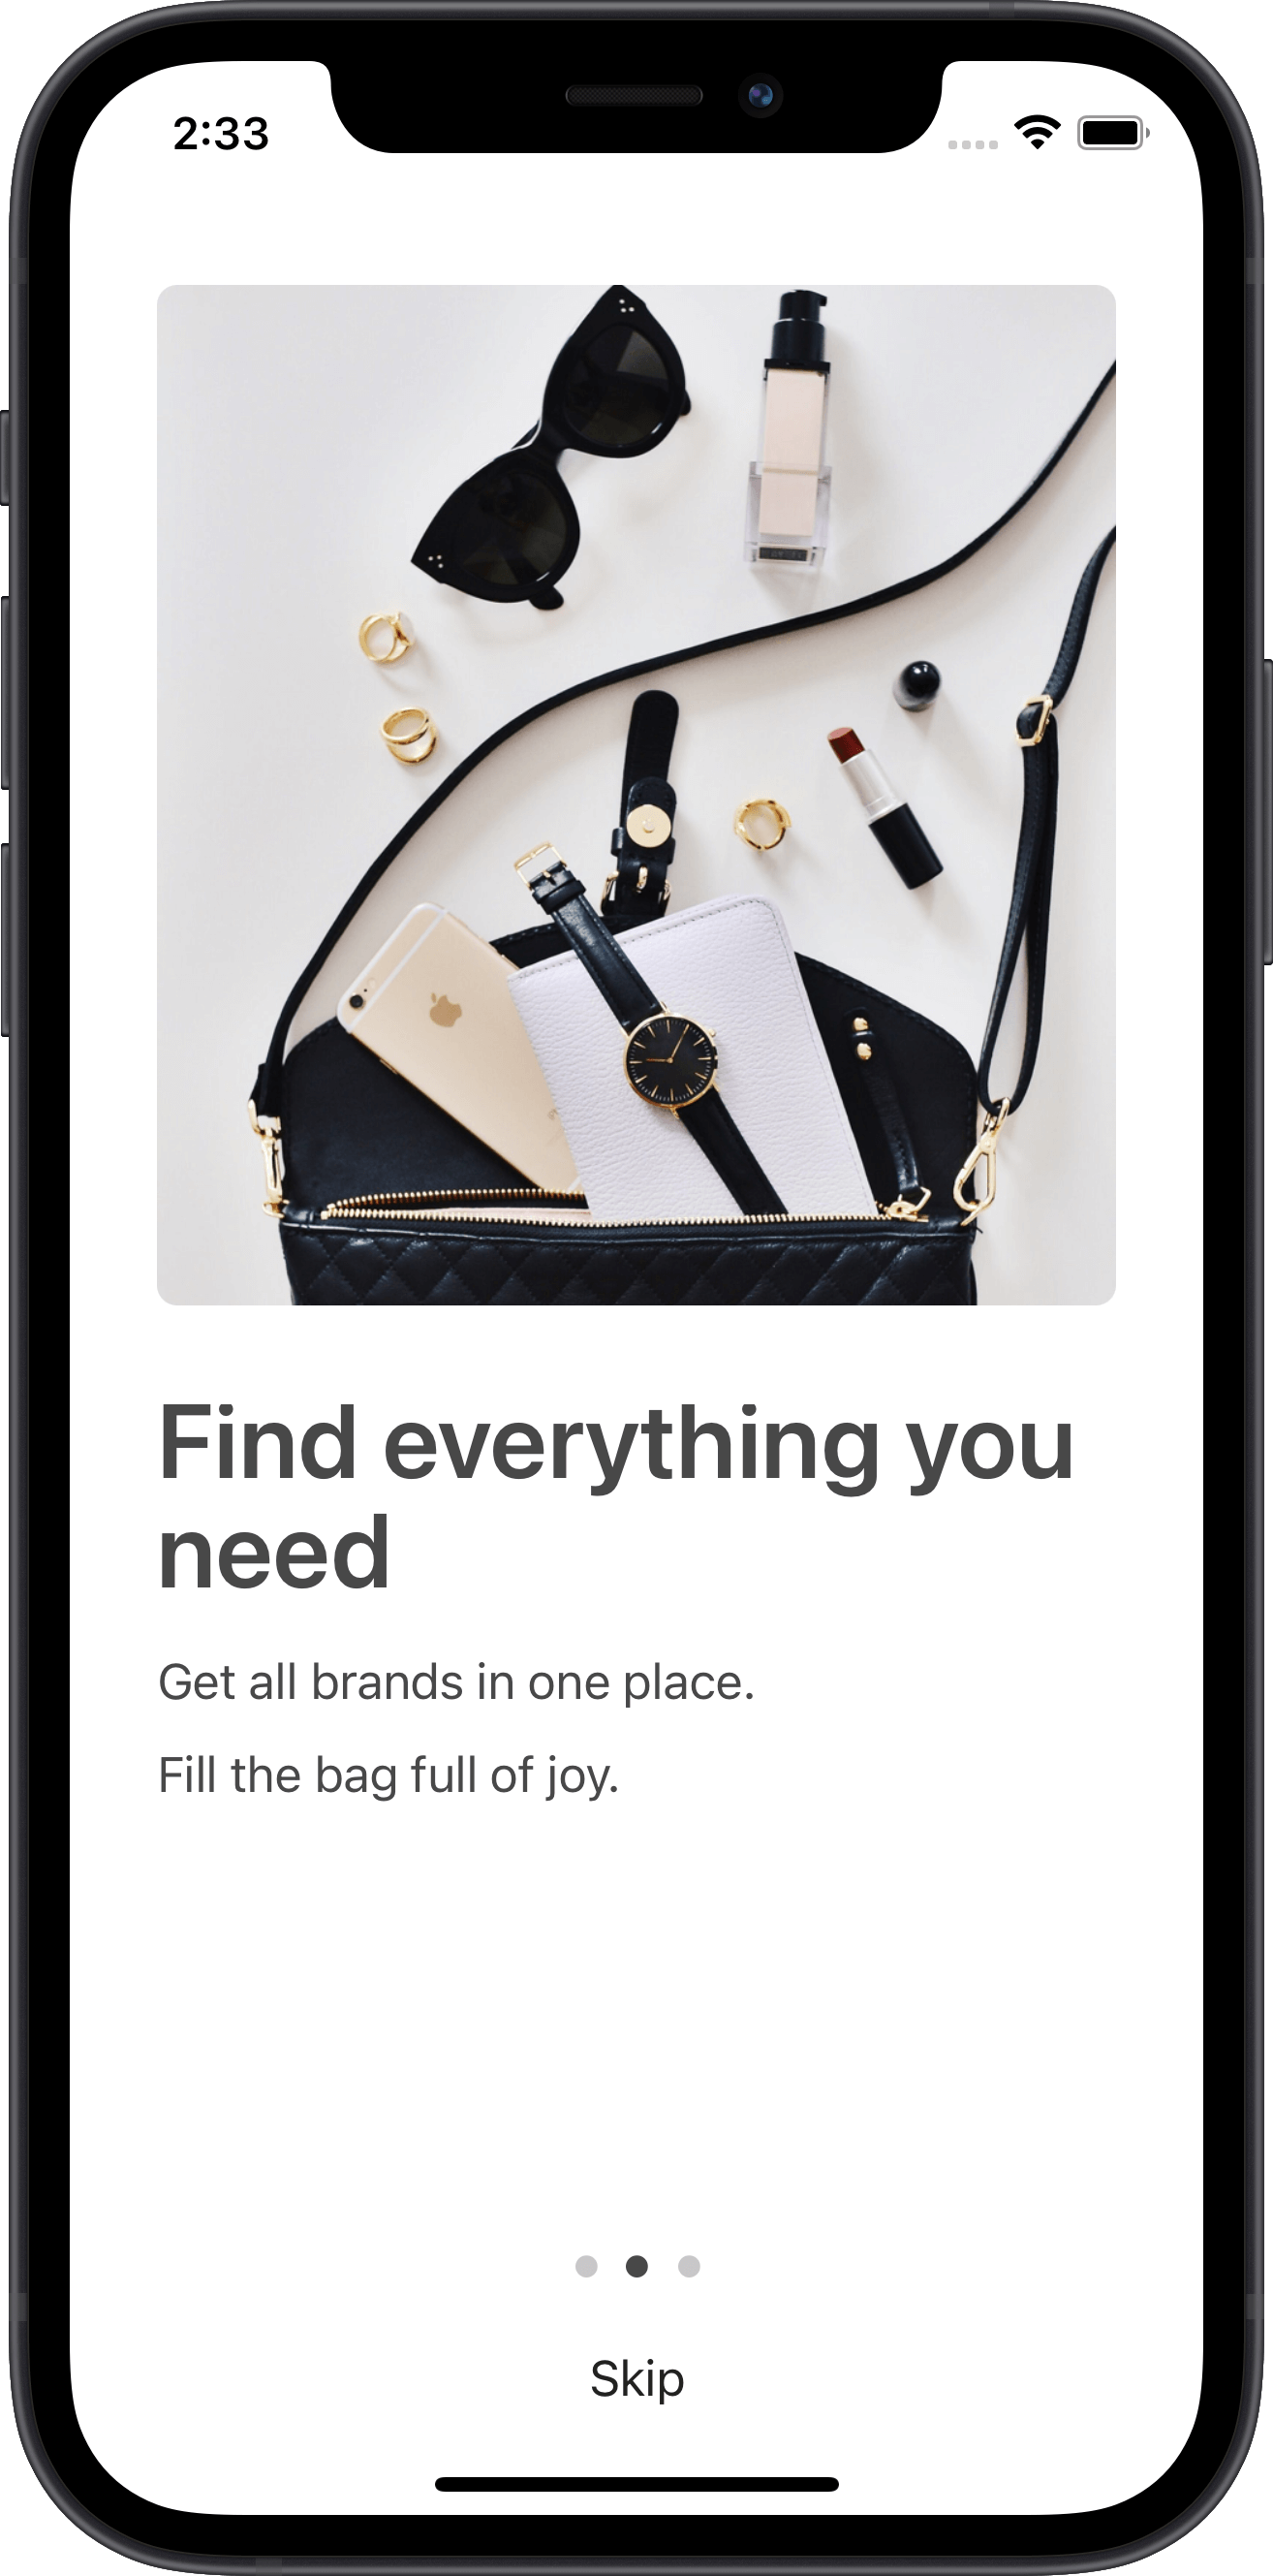 e-commerce, walktrought